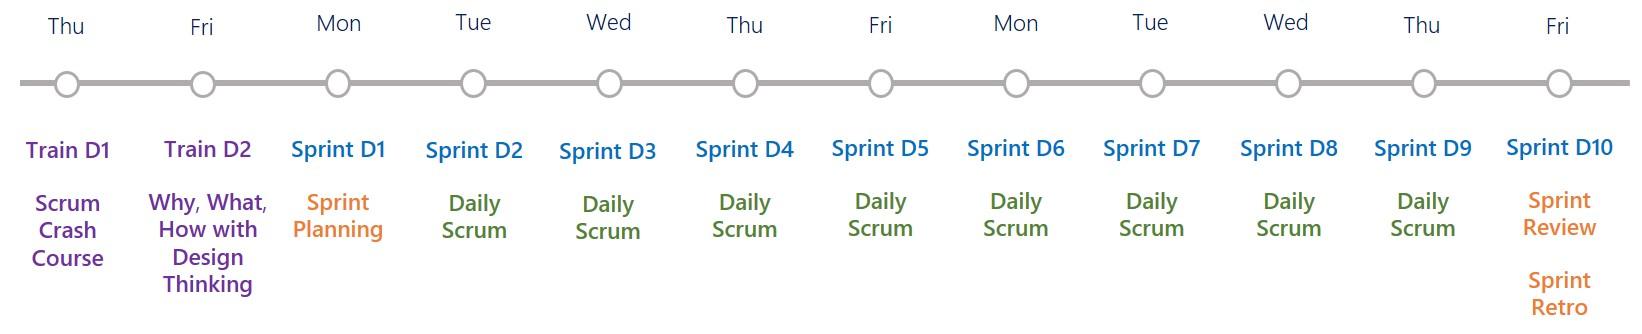 Scrum Sprint pilot timeline